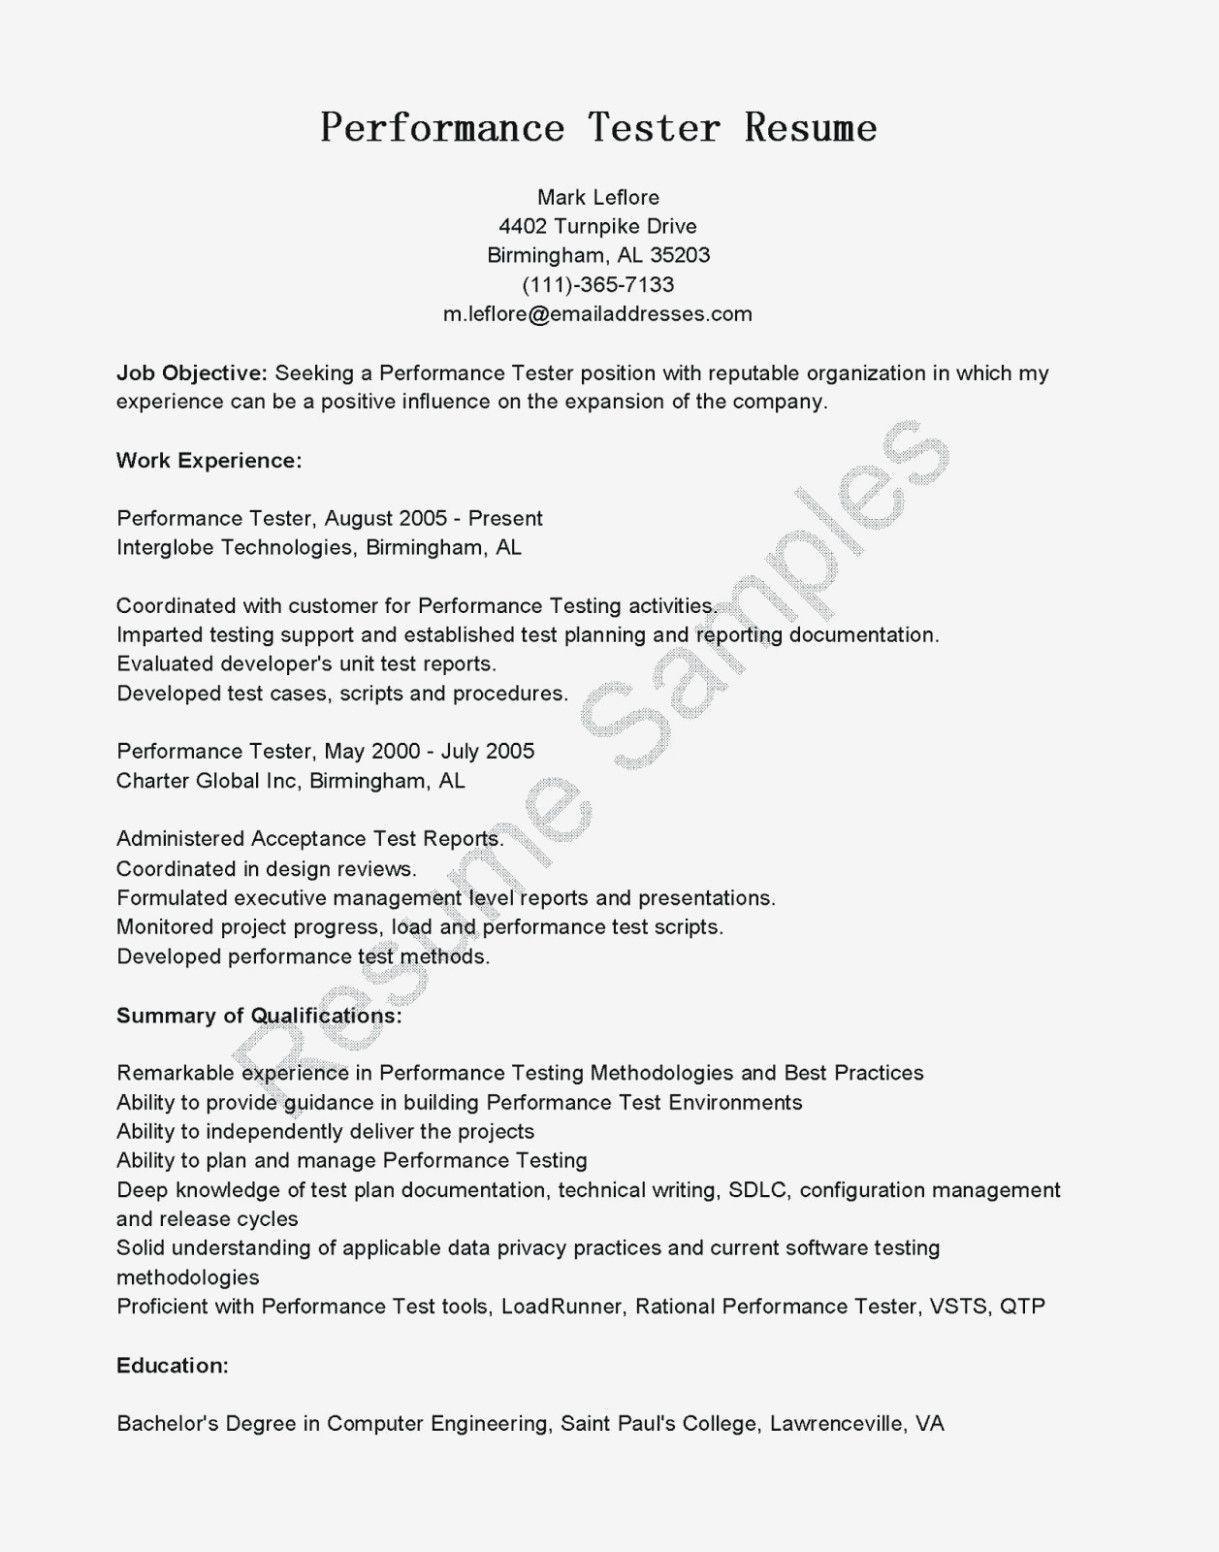 Qa Tester Resume No Experience Popular 10 Qa Tester Resume No Experience Of 25 Popular Qa Tes Resume No Experience Resume Resume Advice